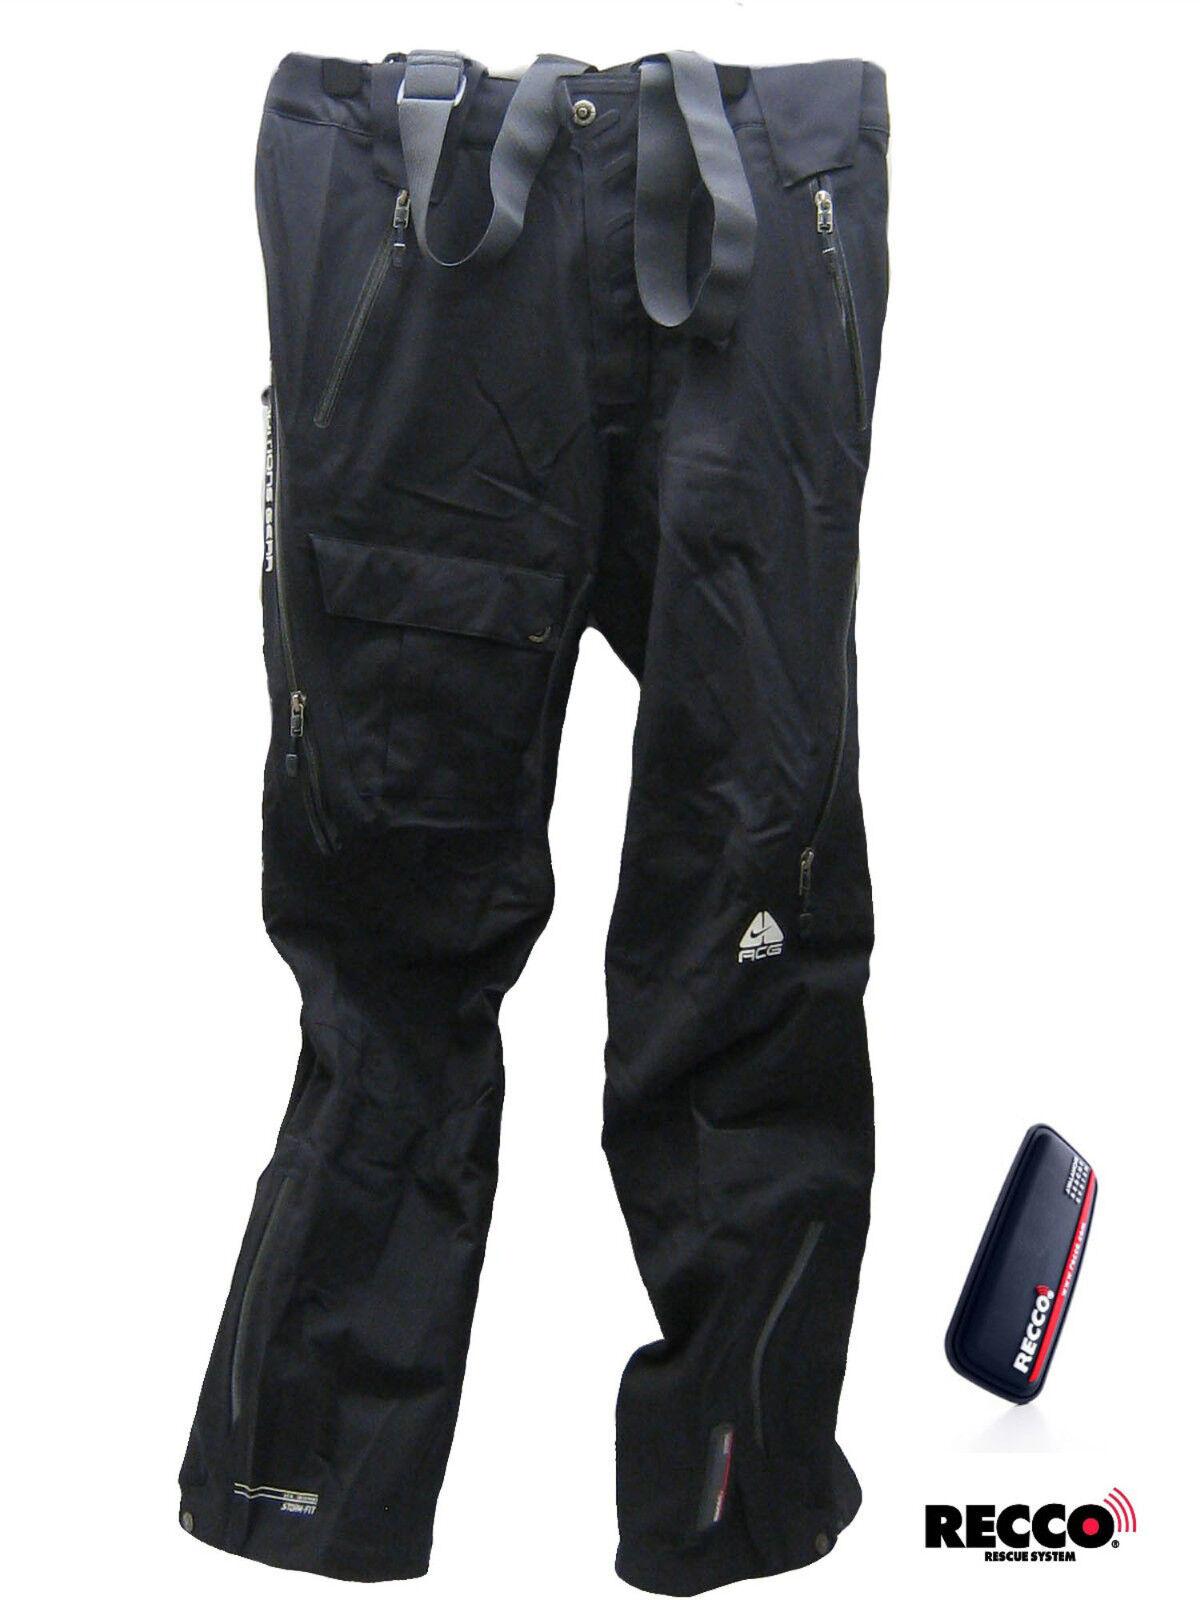 Nike Mujer Acg Recco Peto de Esquiar Pantalones Negros XXL